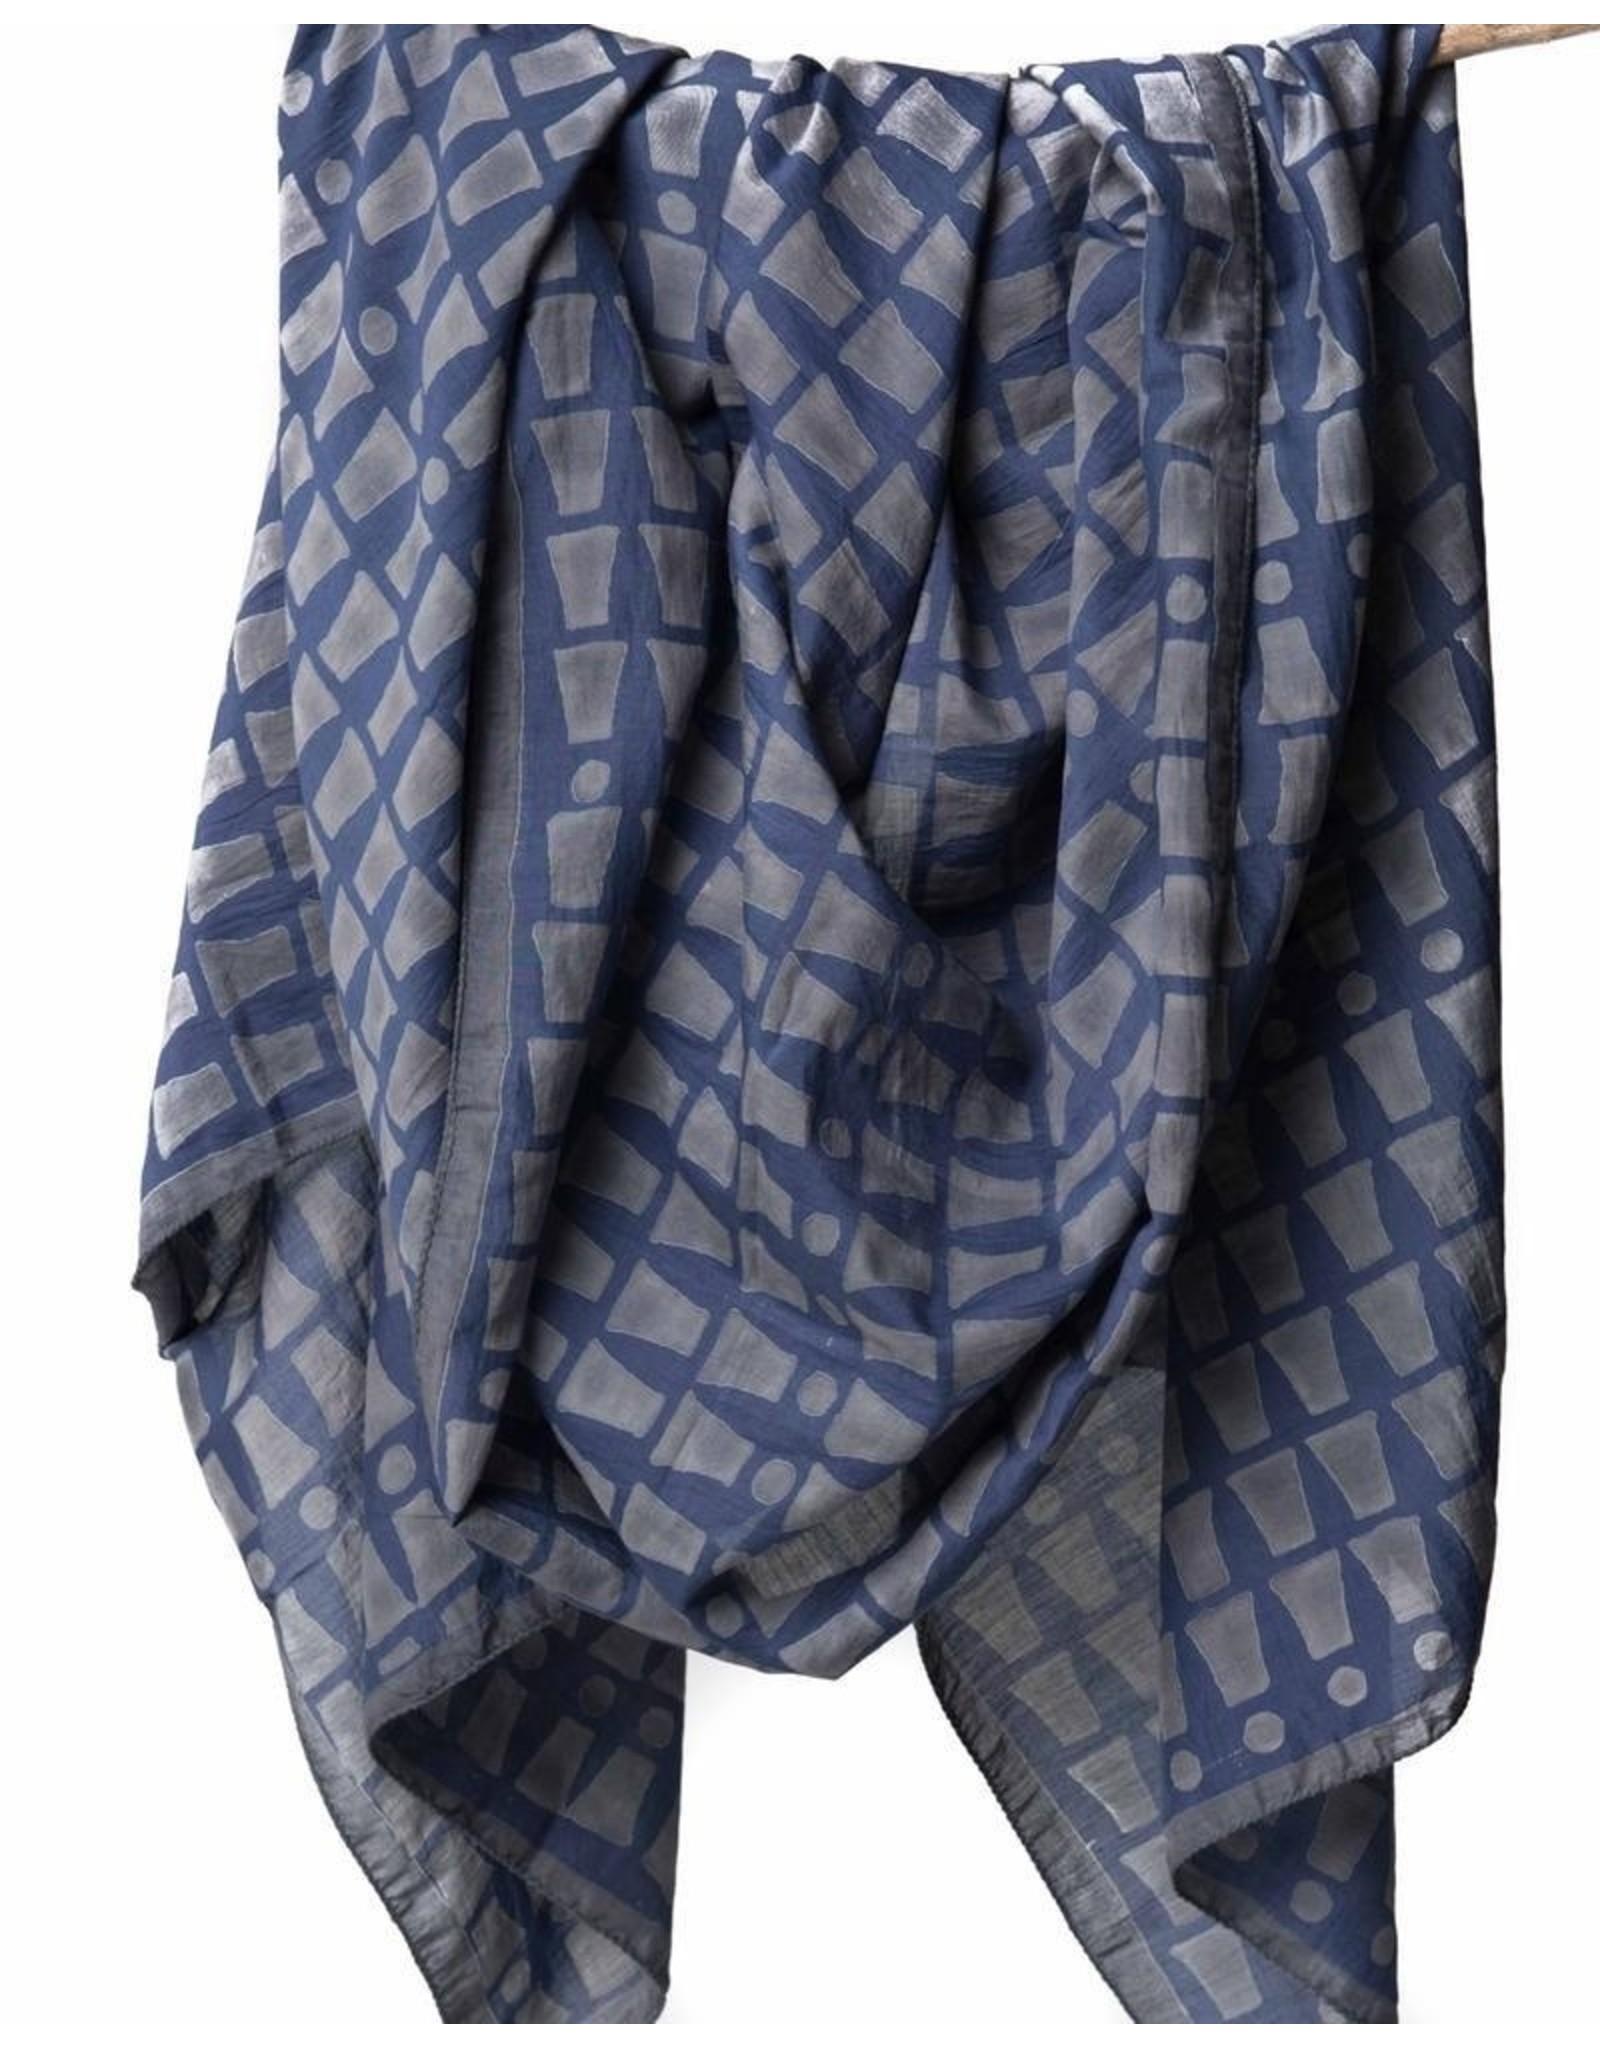 Bloom & Give Bari Navy Silk Cotton Scarf